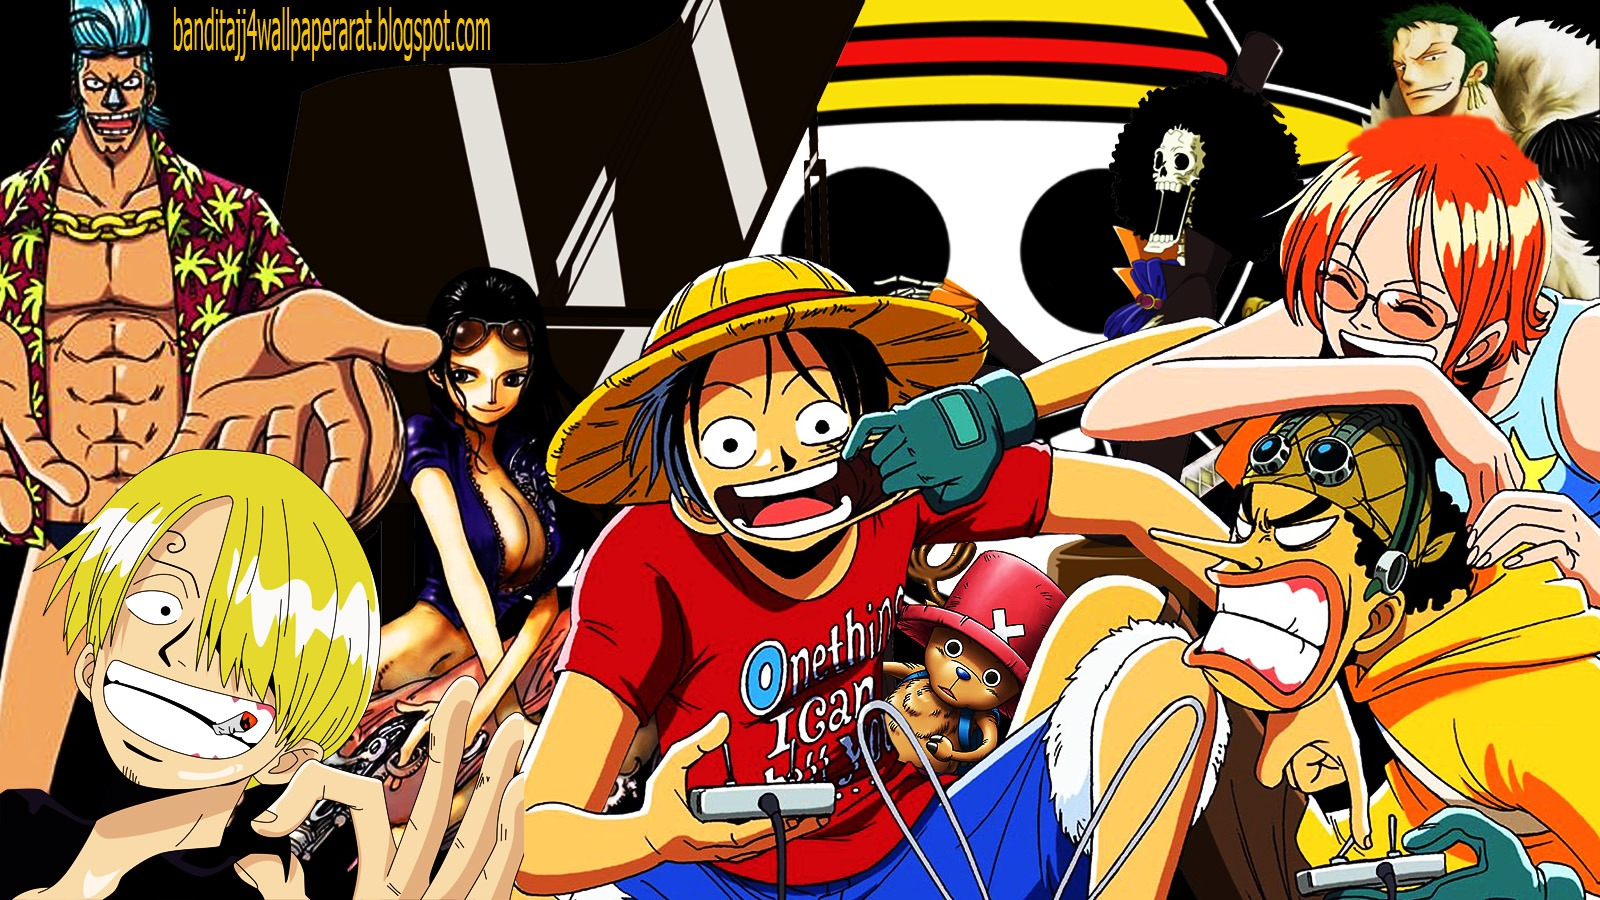 Download Gambar One Piece Keren 1600x900 Wallpaper Teahub Io